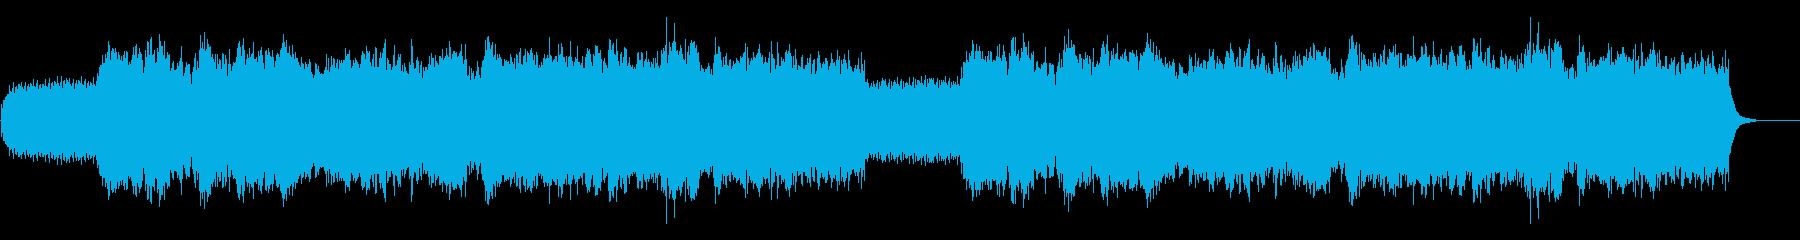 RPGのダンジョン用のBGMです。の再生済みの波形